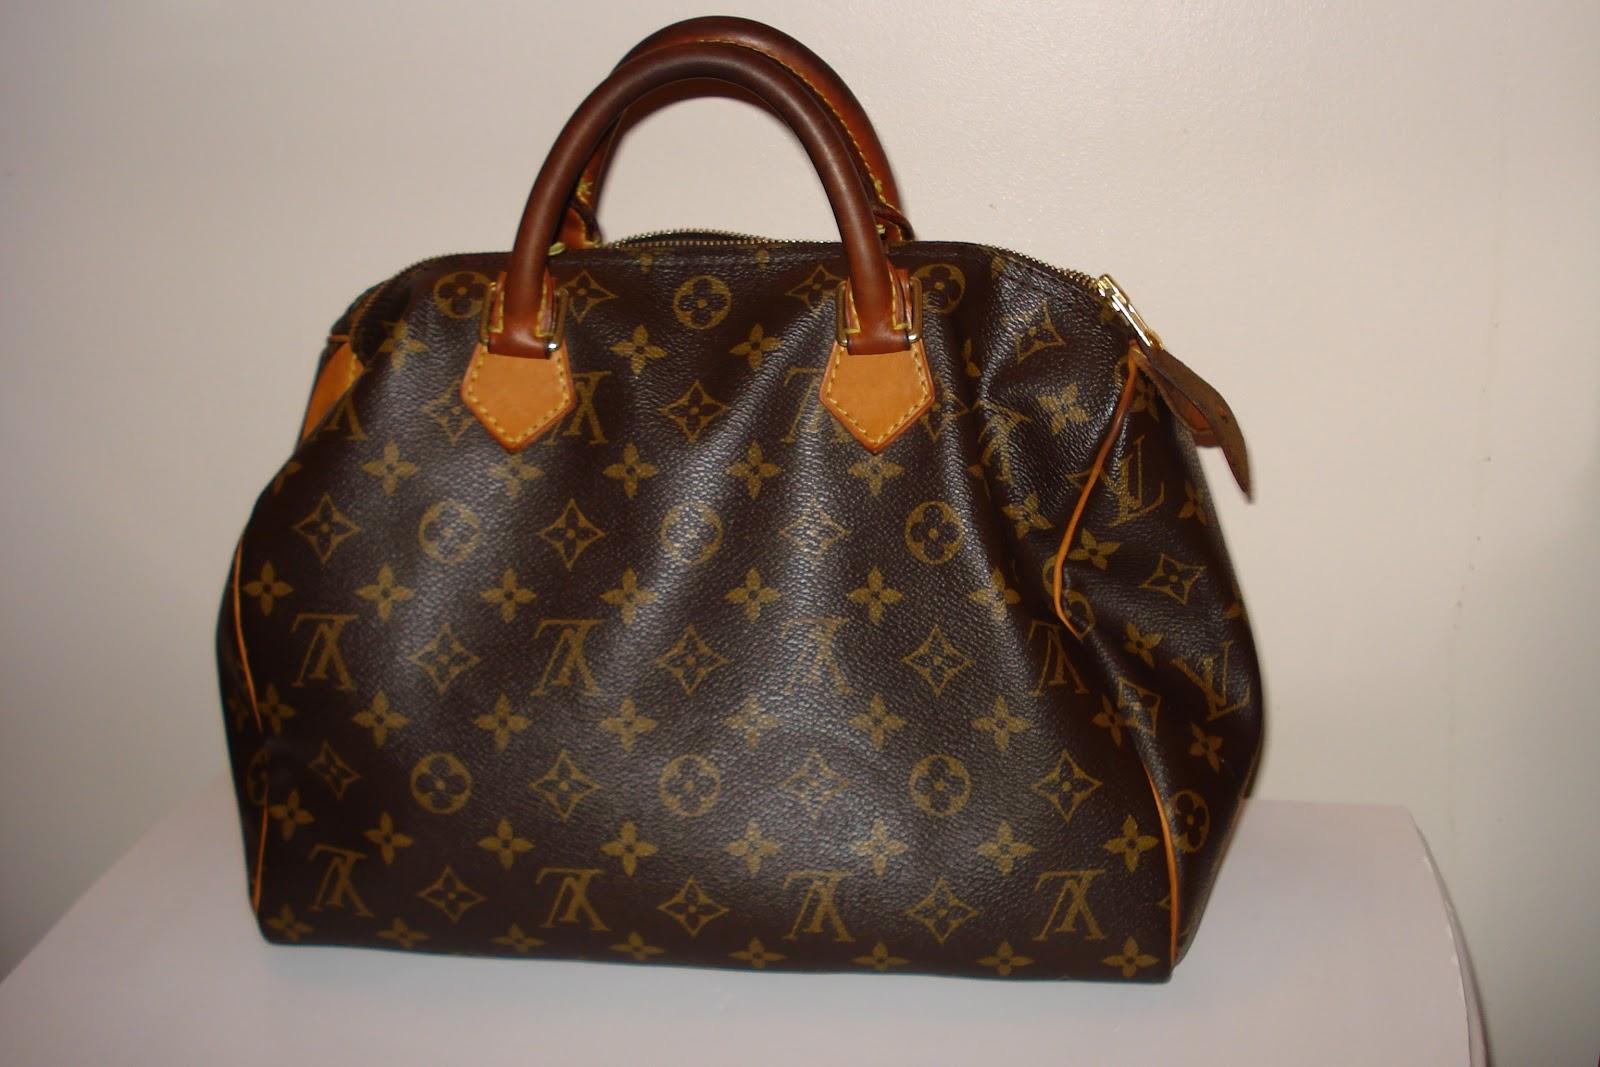 louis vuitton 2012 bags prices